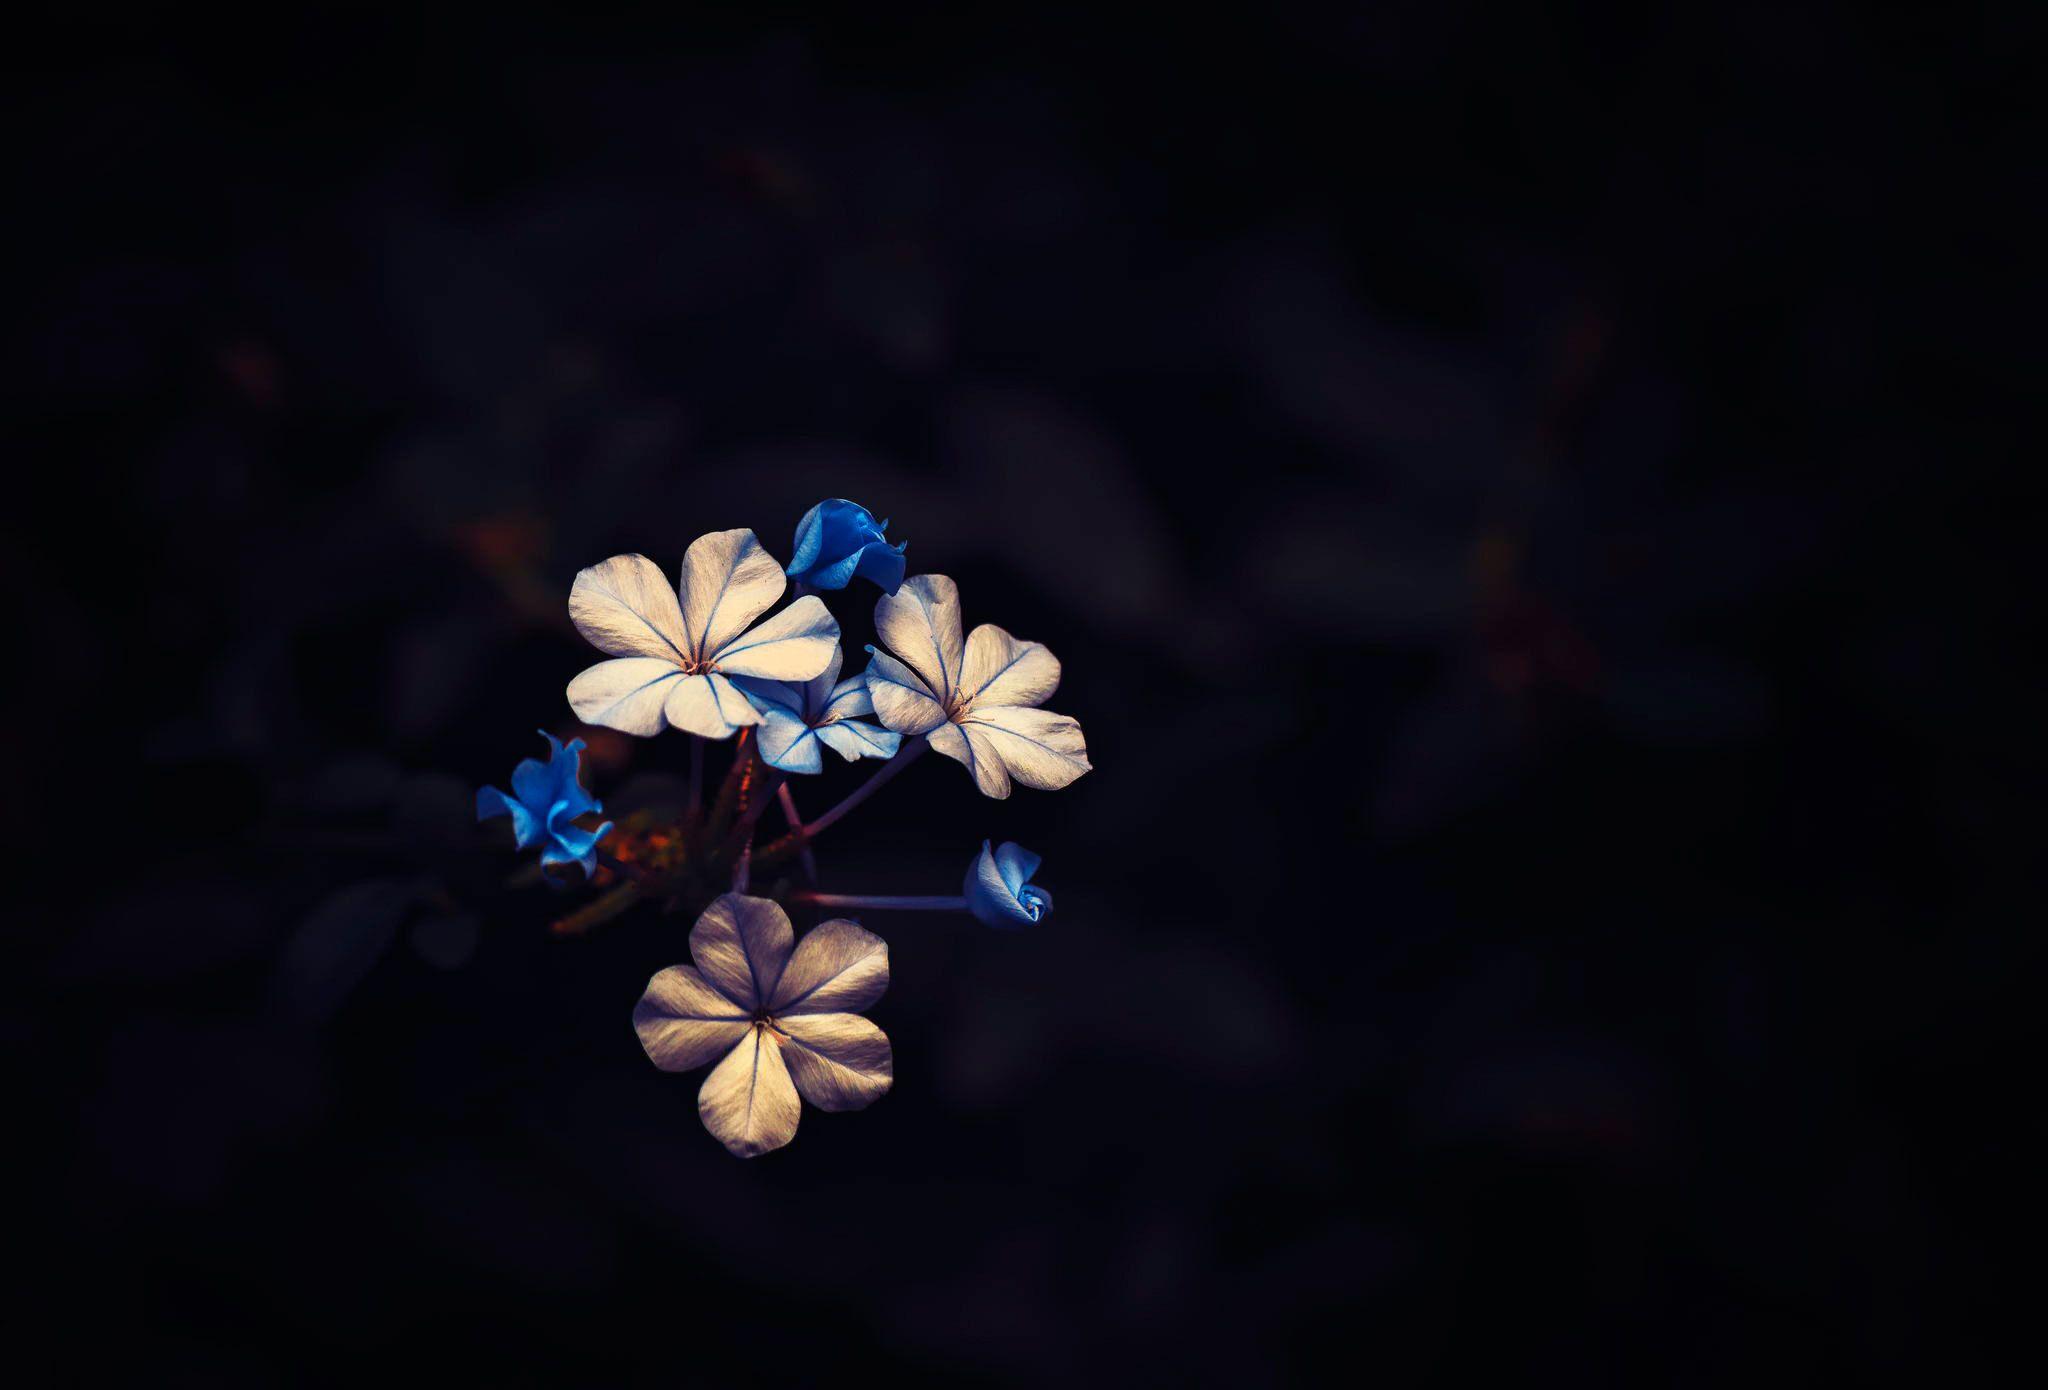 Pin By Home Decor On Flowers Blue Flower Wallpaper Black Background Wallpaper Dark Flowers